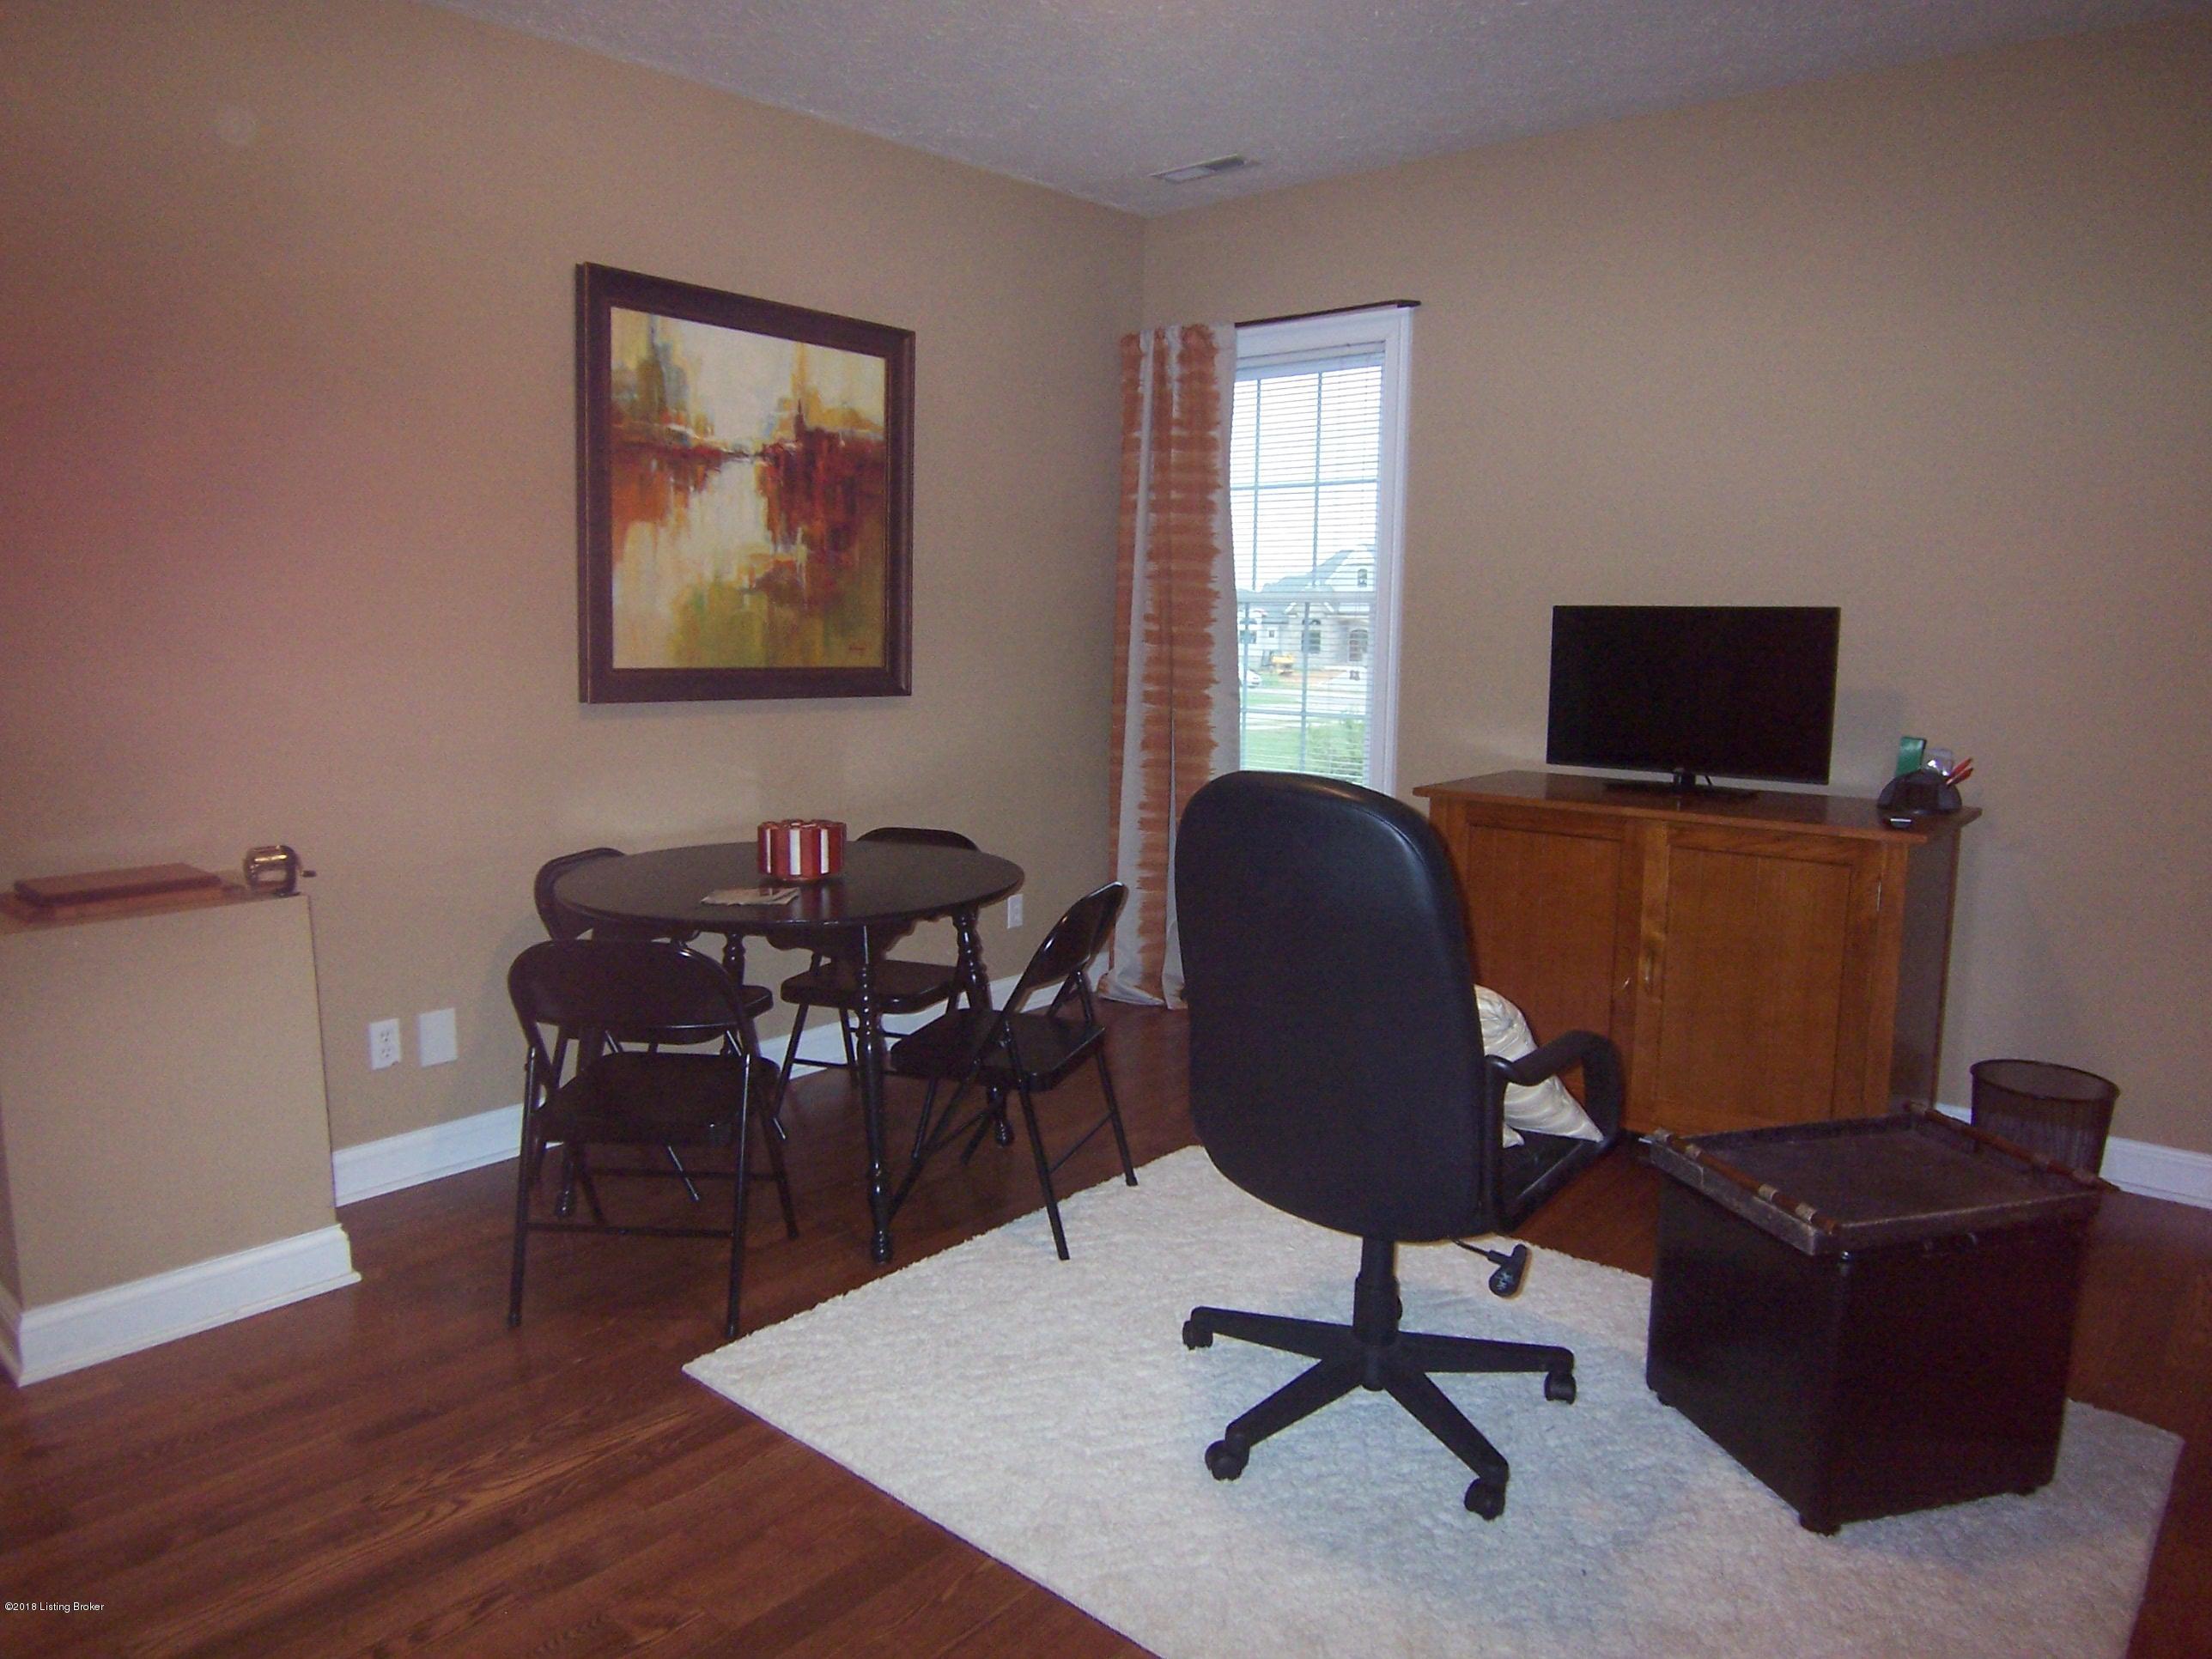 103 Morgan Ct, Bardstown, Kentucky 40004, 4 Bedrooms Bedrooms, 10 Rooms Rooms,4 BathroomsBathrooms,Residential,For Sale,Morgan,1517071